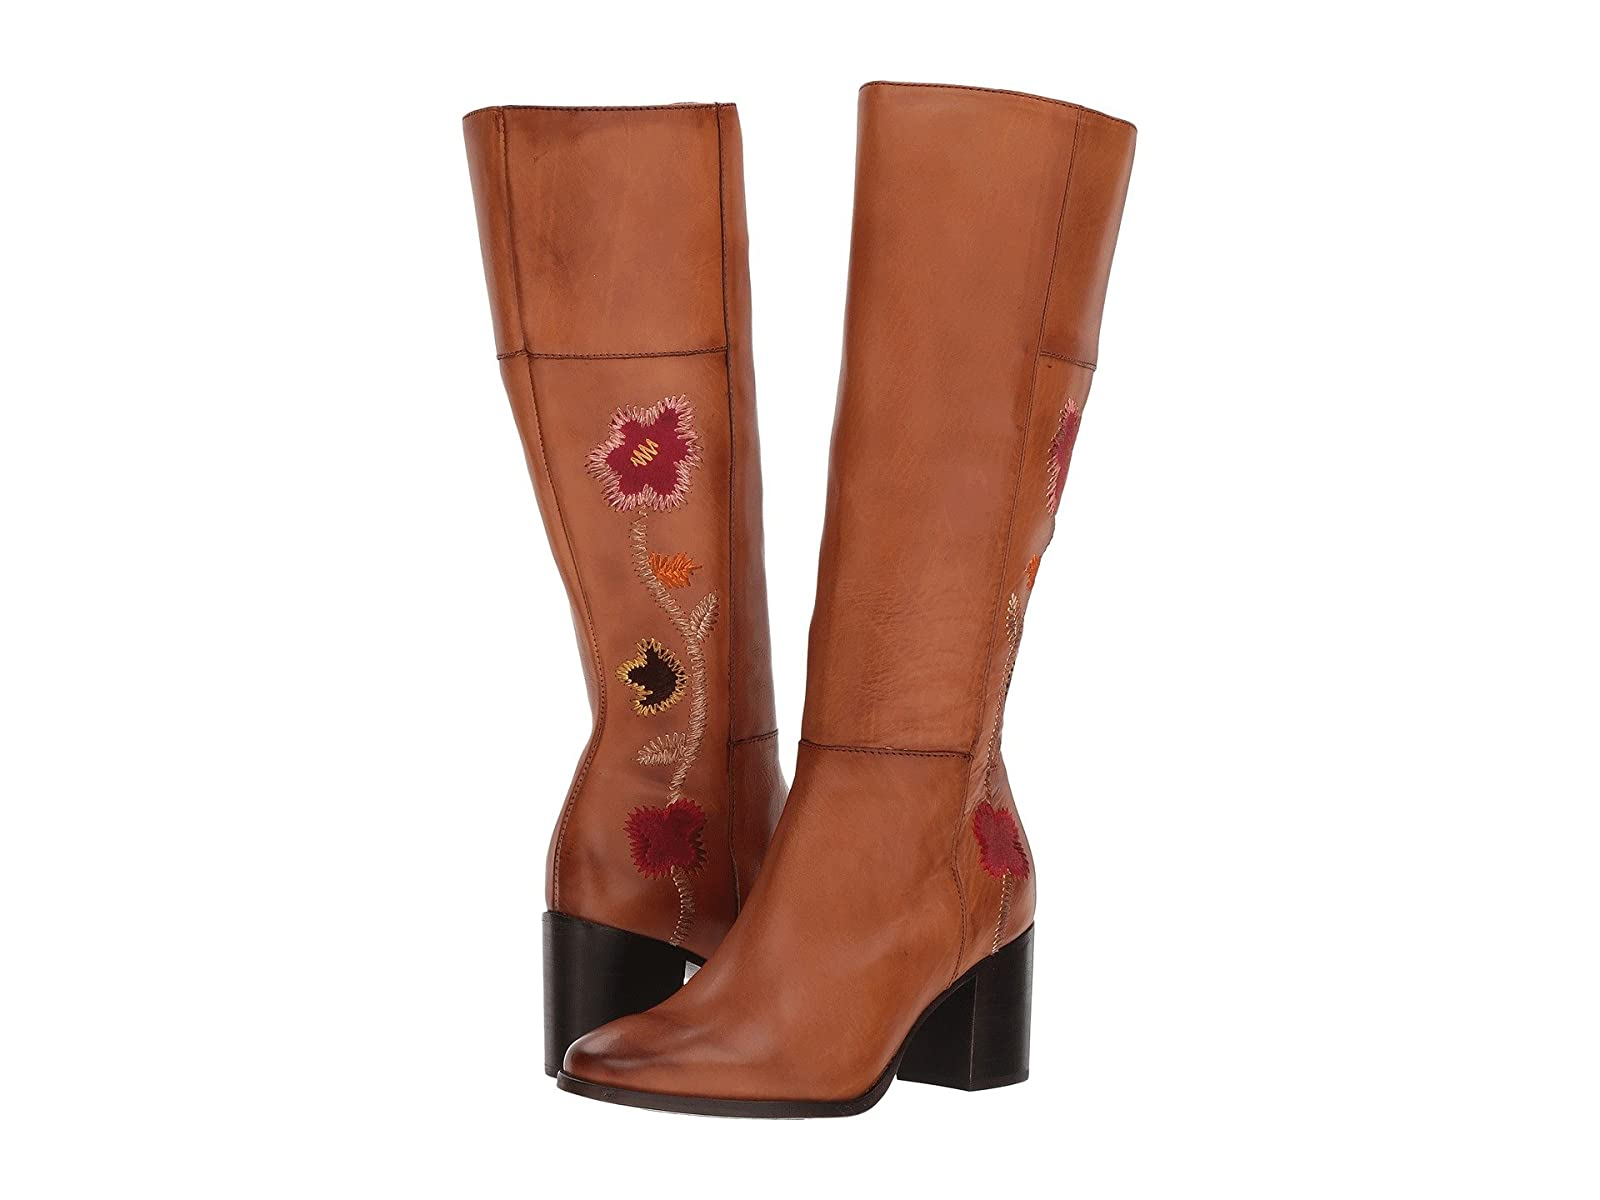 Frye Nova Flower TallCheap and distinctive eye-catching shoes